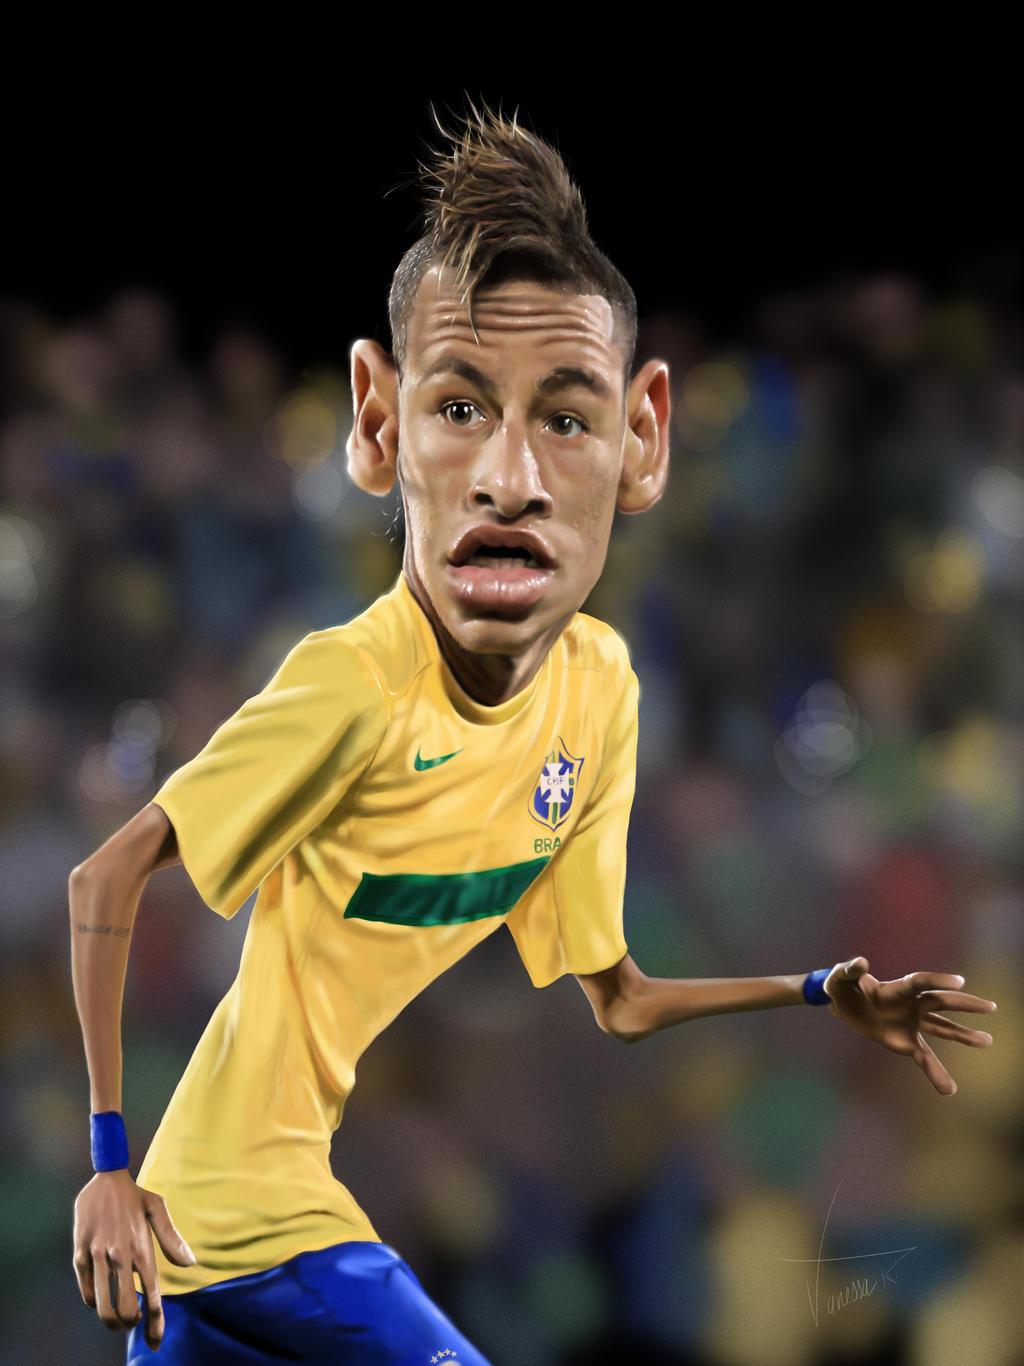 Neymar Cartoon Drawing Neymar by vanessaribeiro